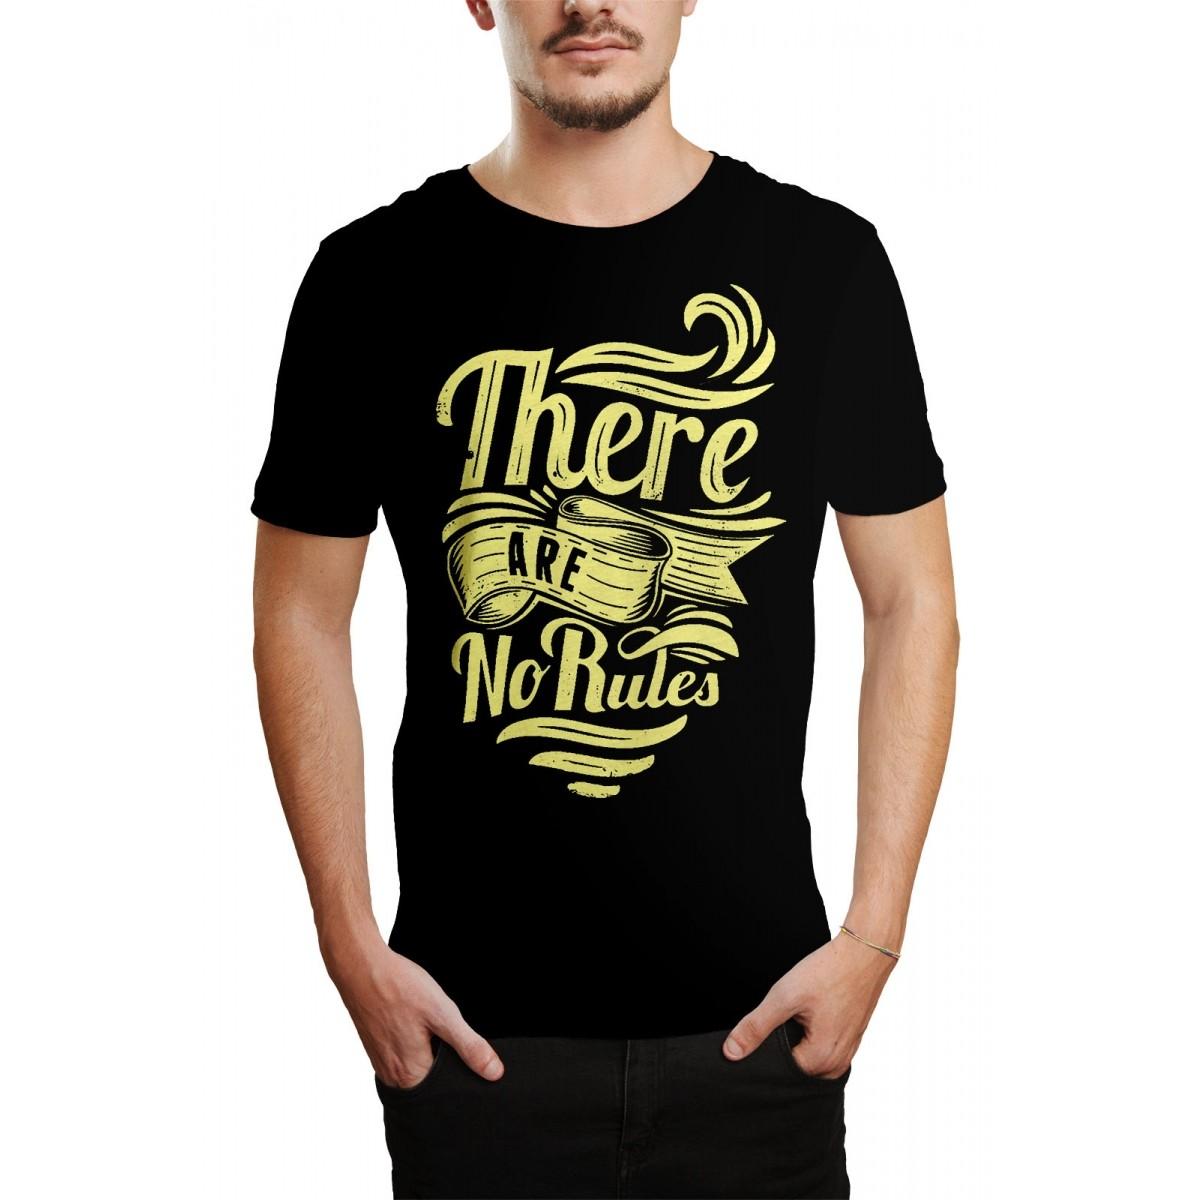 Camiseta HShop No Rules Preto Preto  - HShop